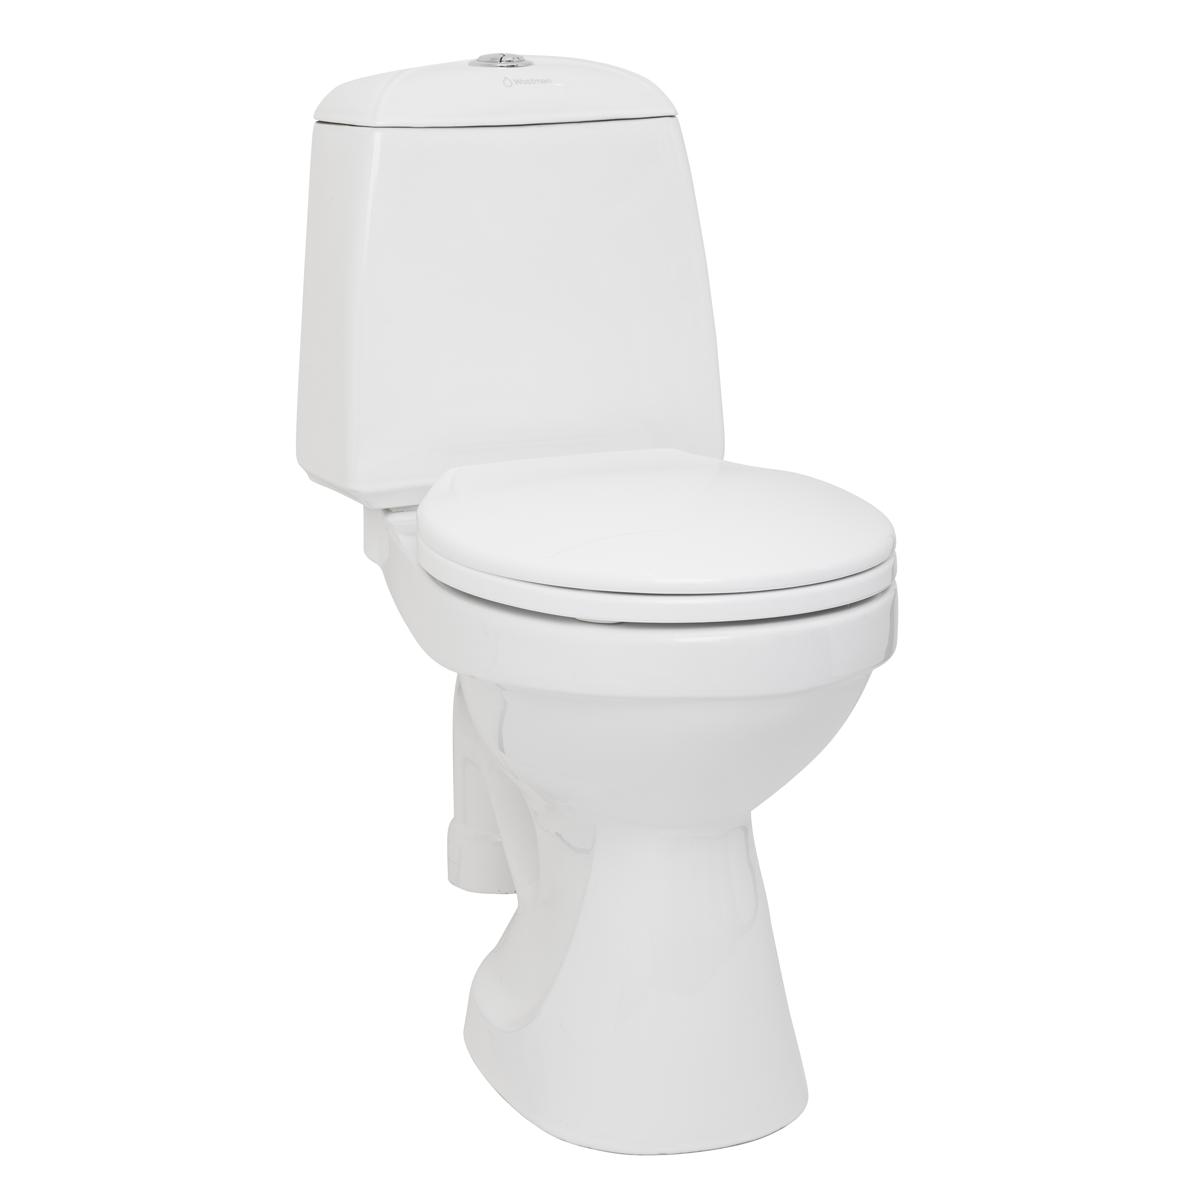 EcoFlush™urine diverting WC - > EcoFlush brochure> EcoFlush manual > EcoFlush user manual